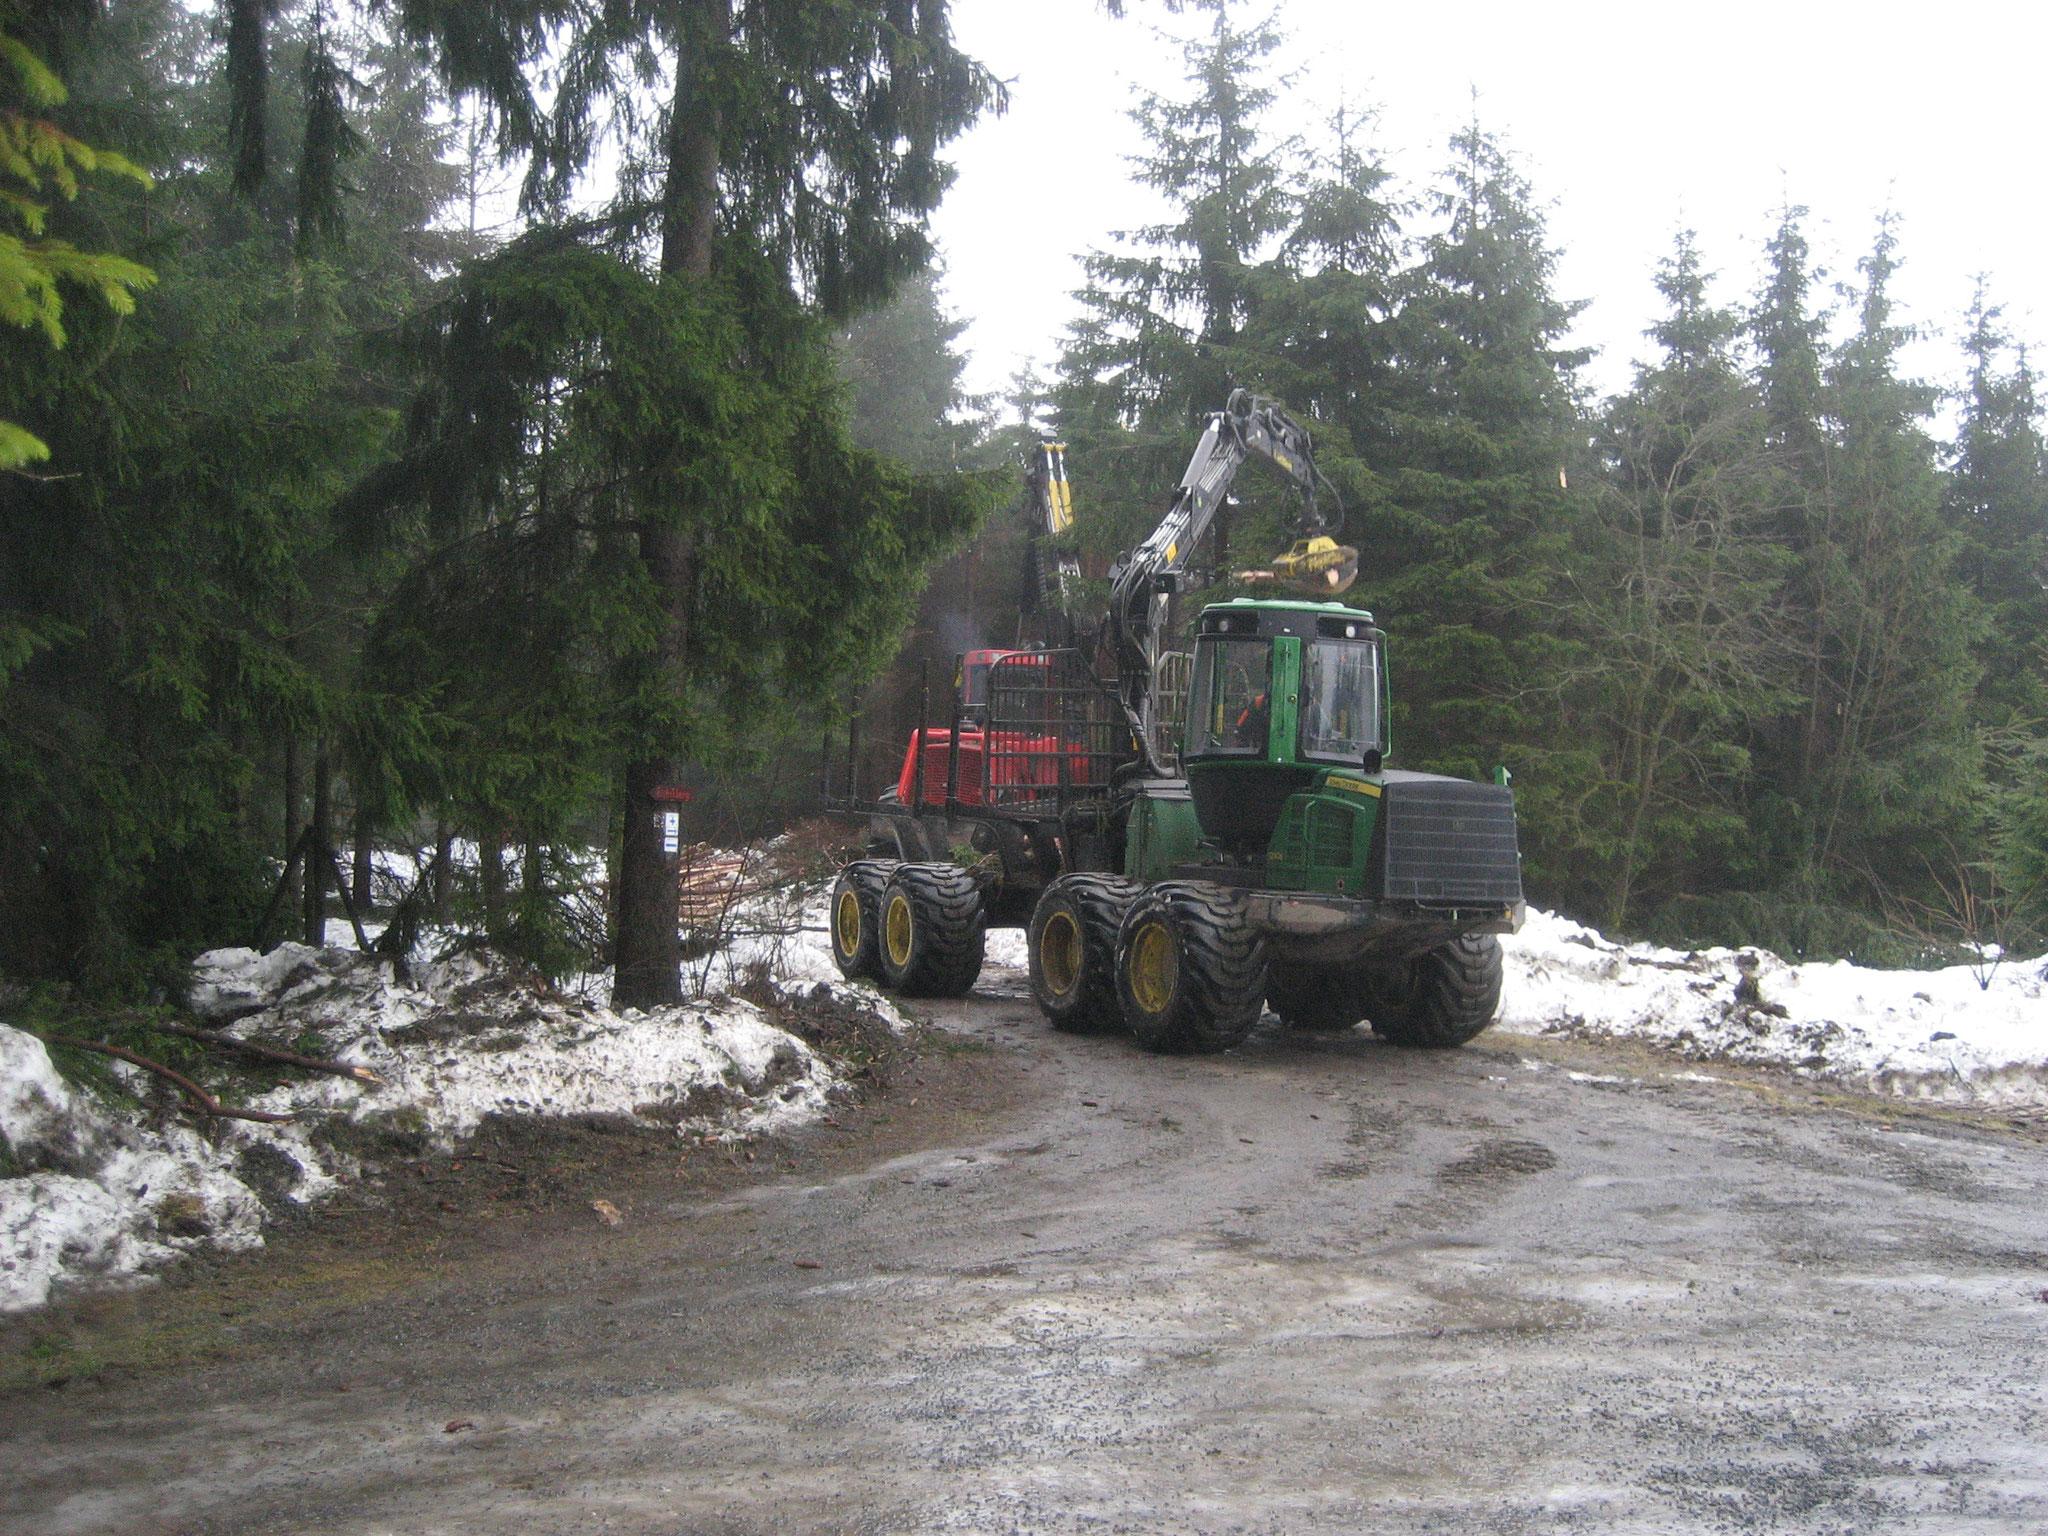 Harvestereinsatz mit Rückezug